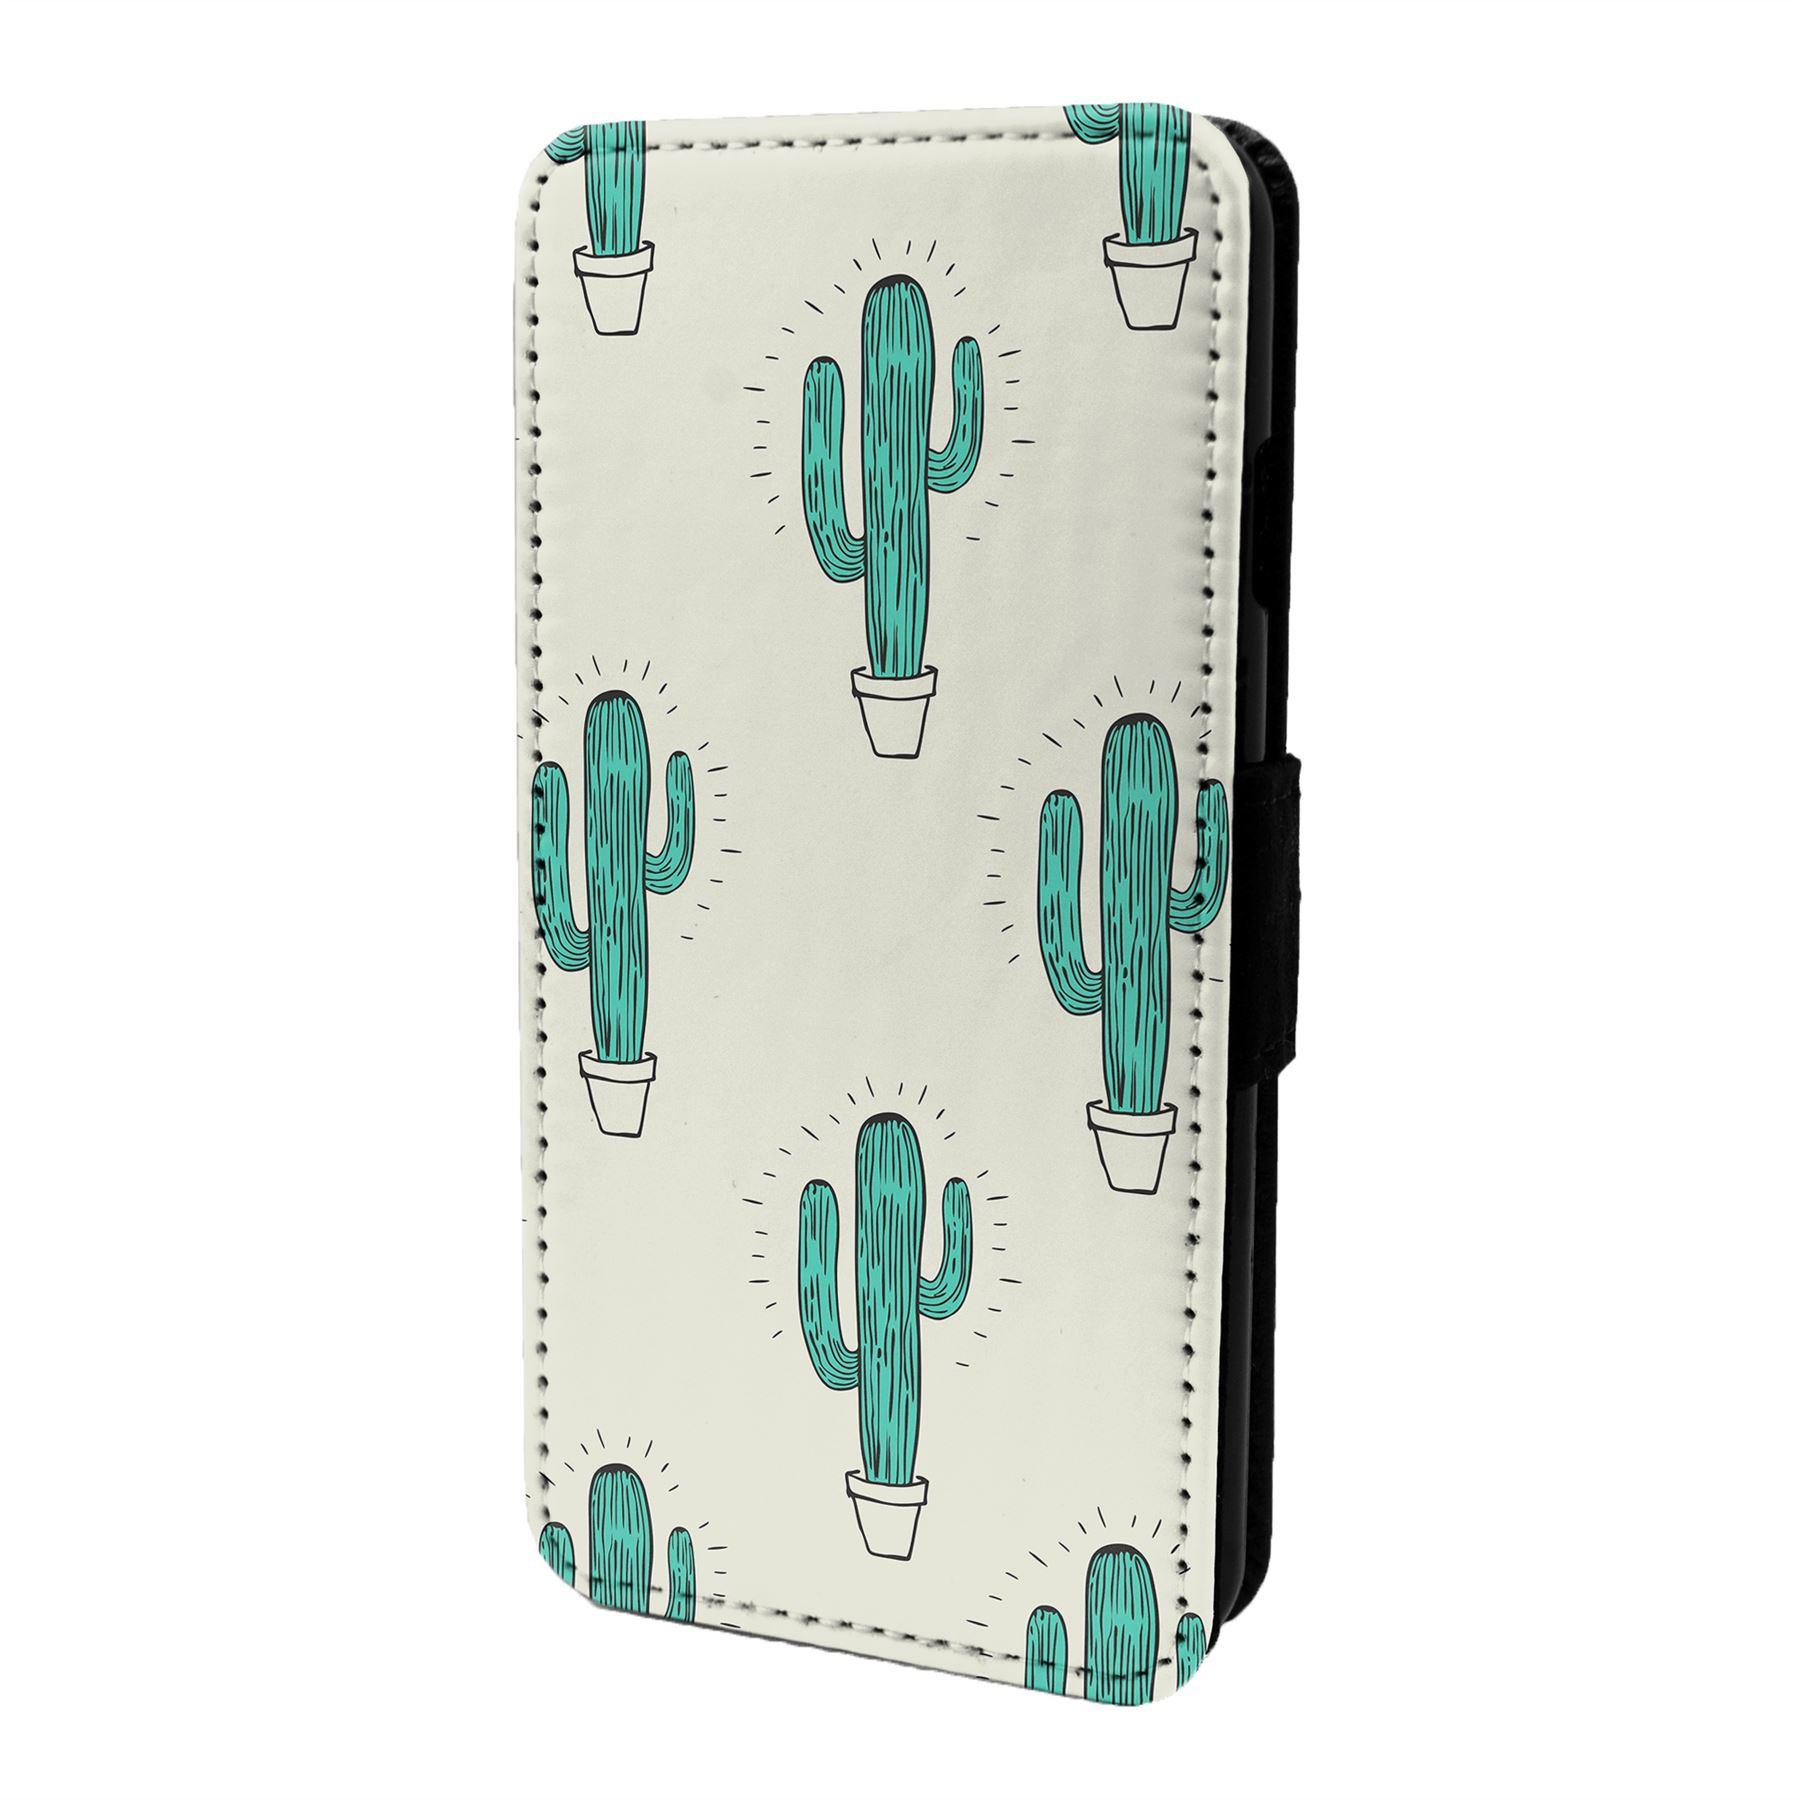 Cactus-Motif-Etui-Rabattable-pour-Telephone-Portable-S6605